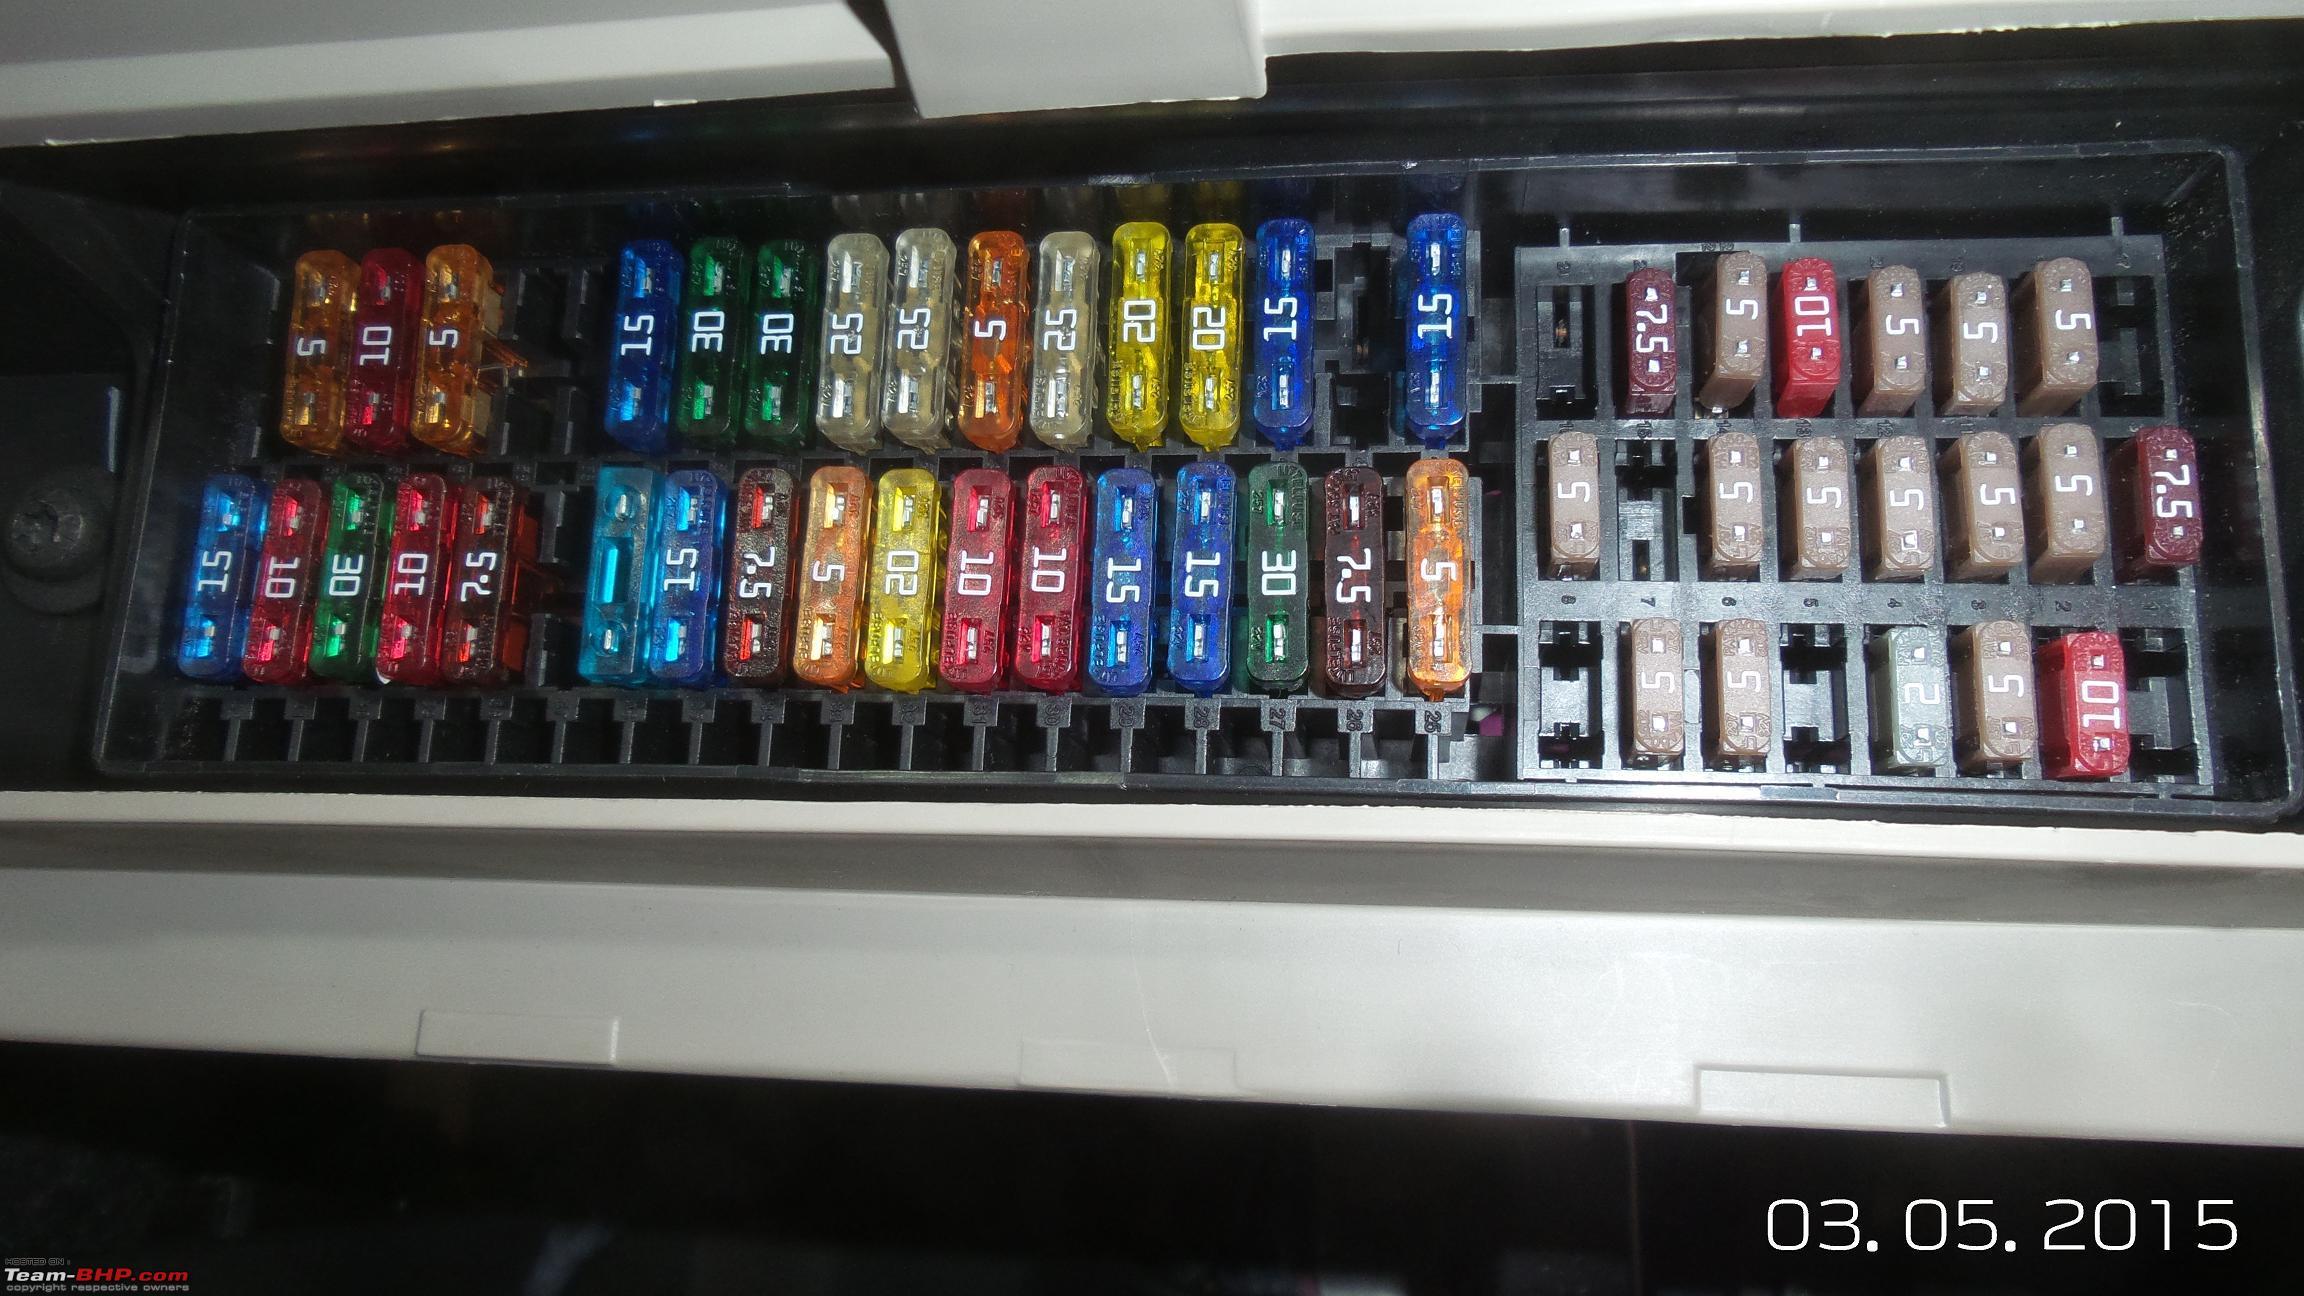 vw mk1 fuse box layout nv 2192  vw polo fuse box layout schematic wiring  vw polo fuse box layout schematic wiring